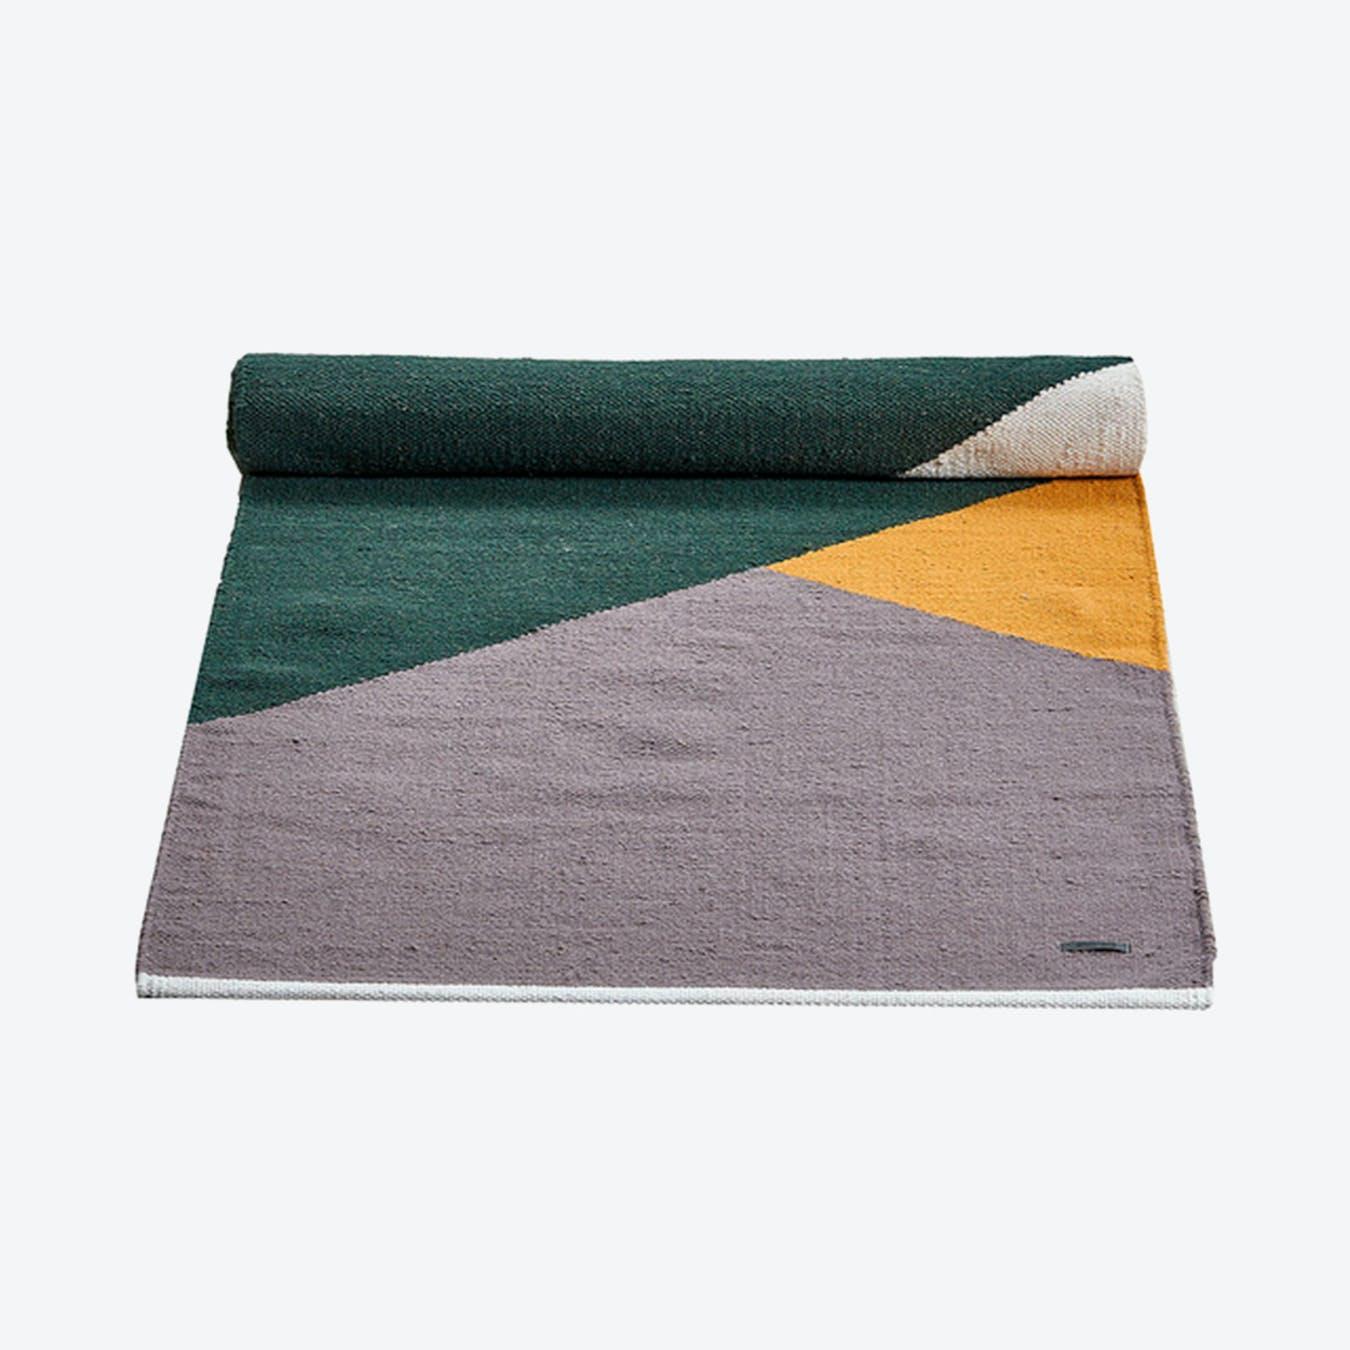 Horizon Wool Rug in Green, Amber, Grey